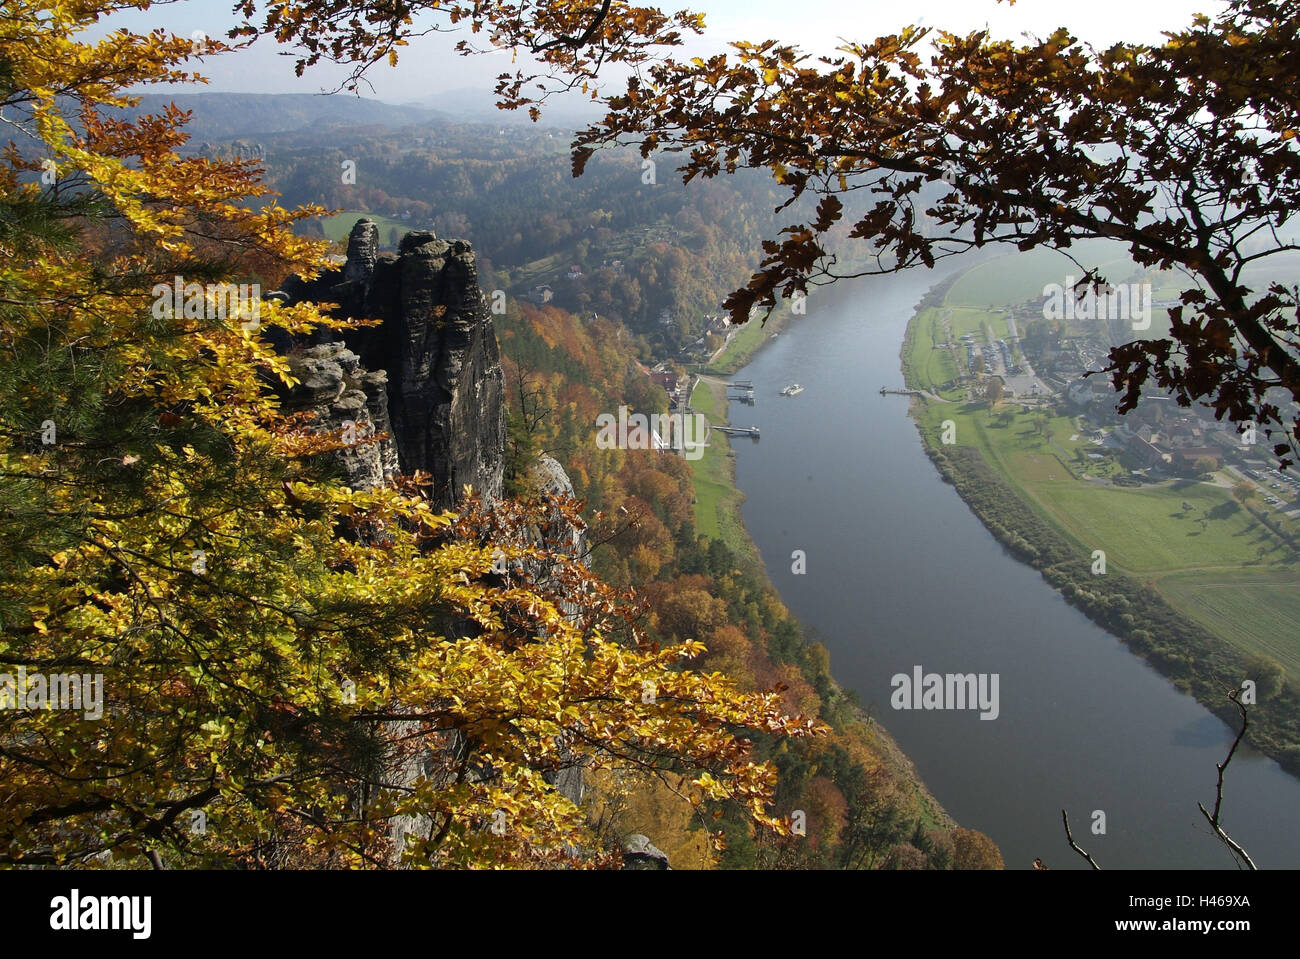 Germany, Saxony, Elbsandsteingebirge, bastion, river Elbe, Rathen, - Stock Image